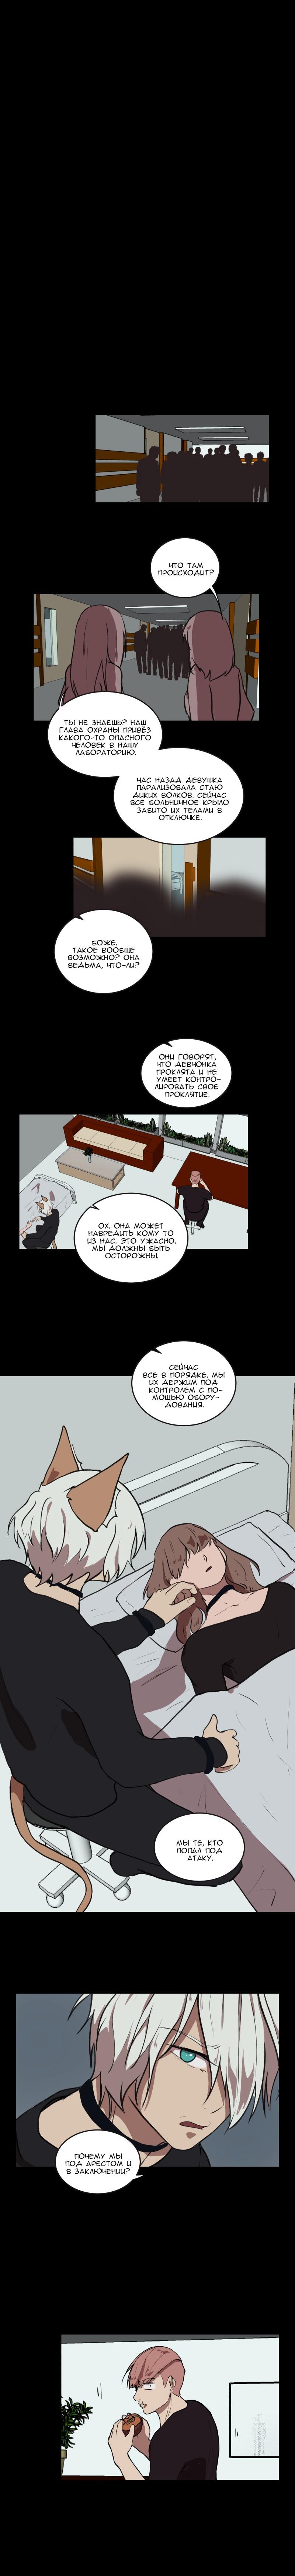 https://r1.ninemanga.com/comics/pic2/58/31802/416870/1533717150586.jpg Page 3